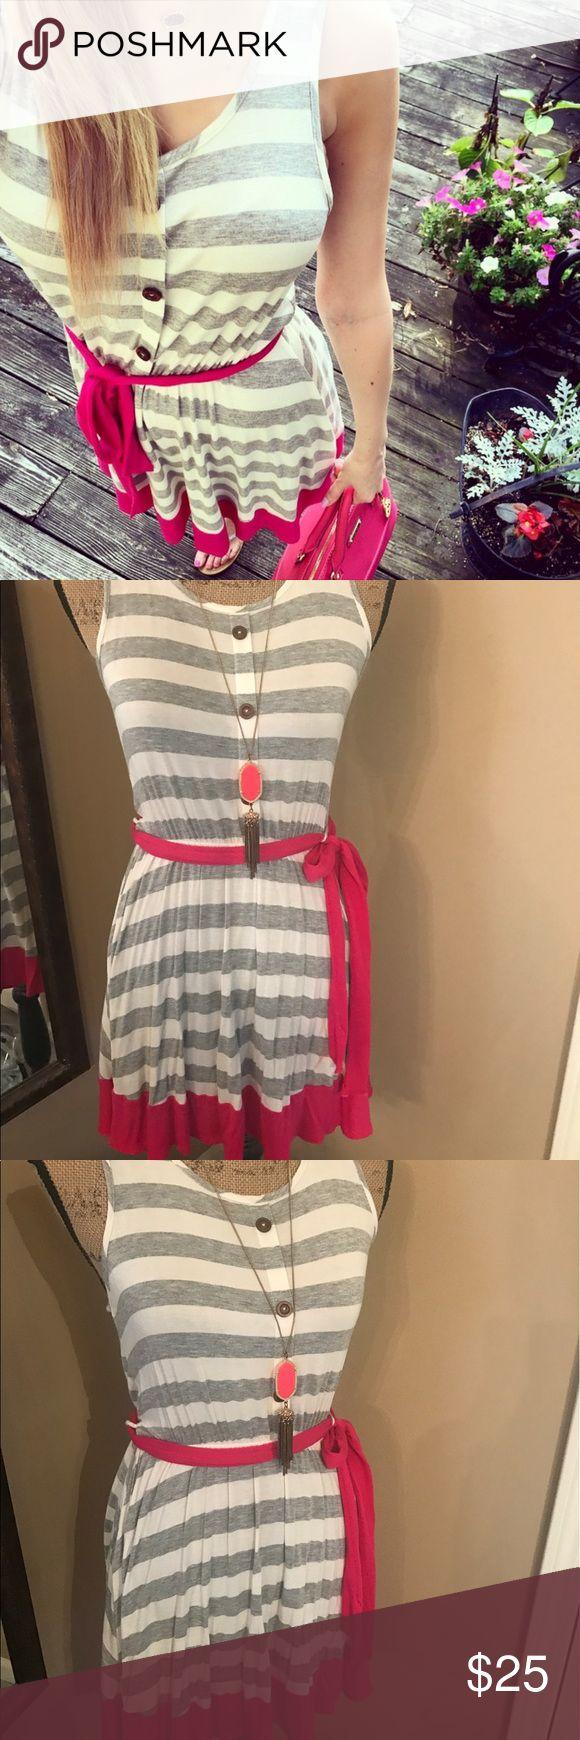 Dottie couture dress Adorable, size small boutique dress. Only wore twice 🌸 dottie couture Dresses Midi